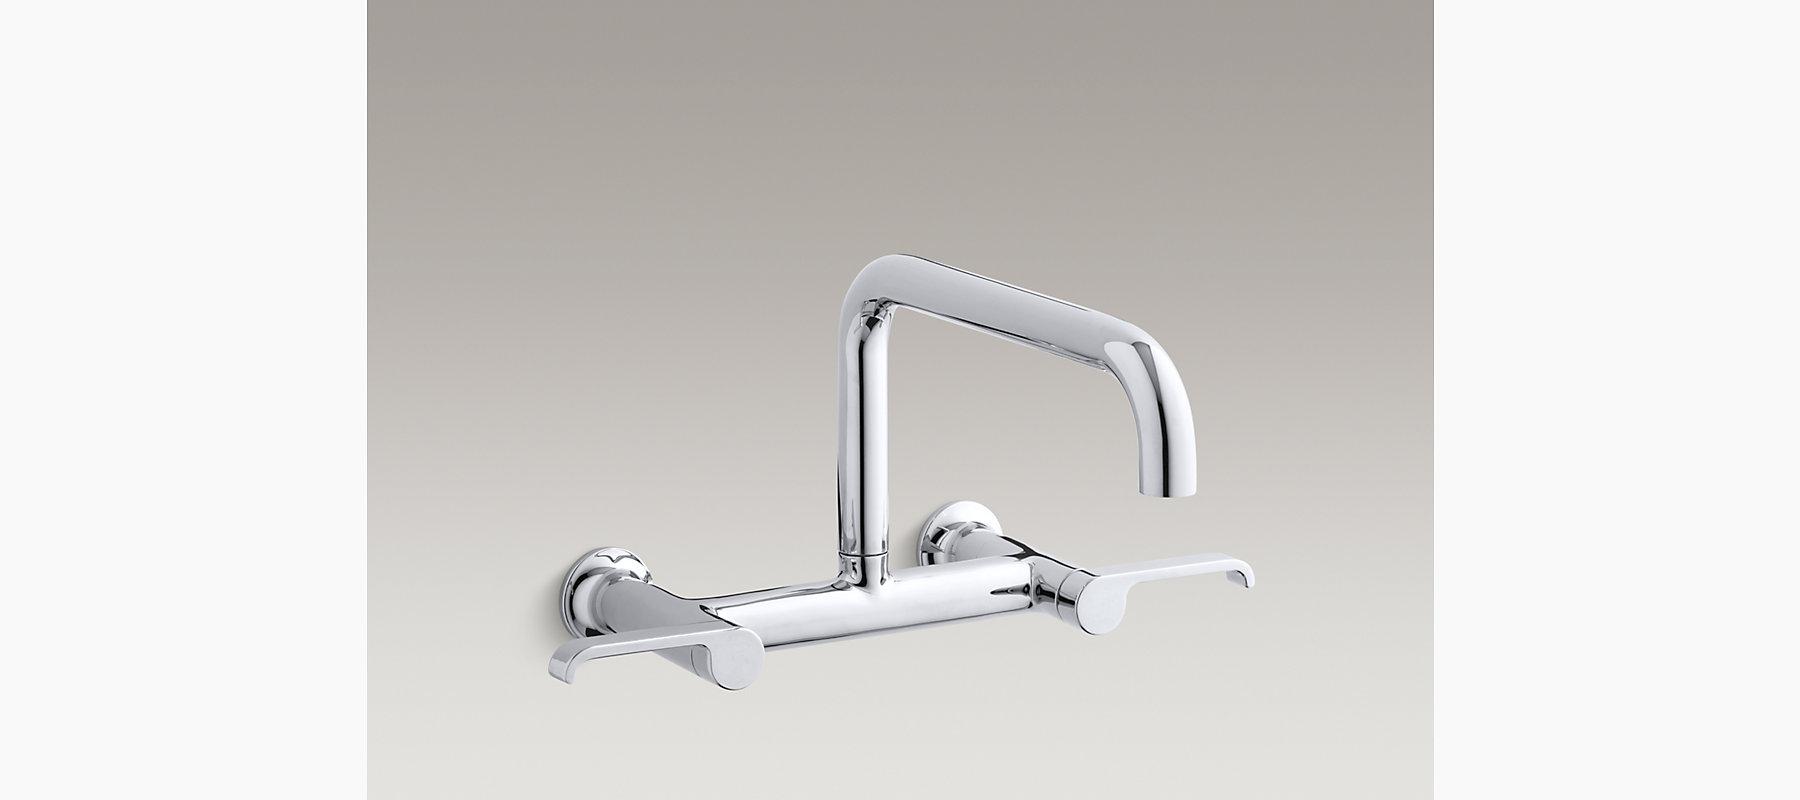 Torq Wall-Mount Bridge Kitchen Faucet | K-6127-4 | KOHLER